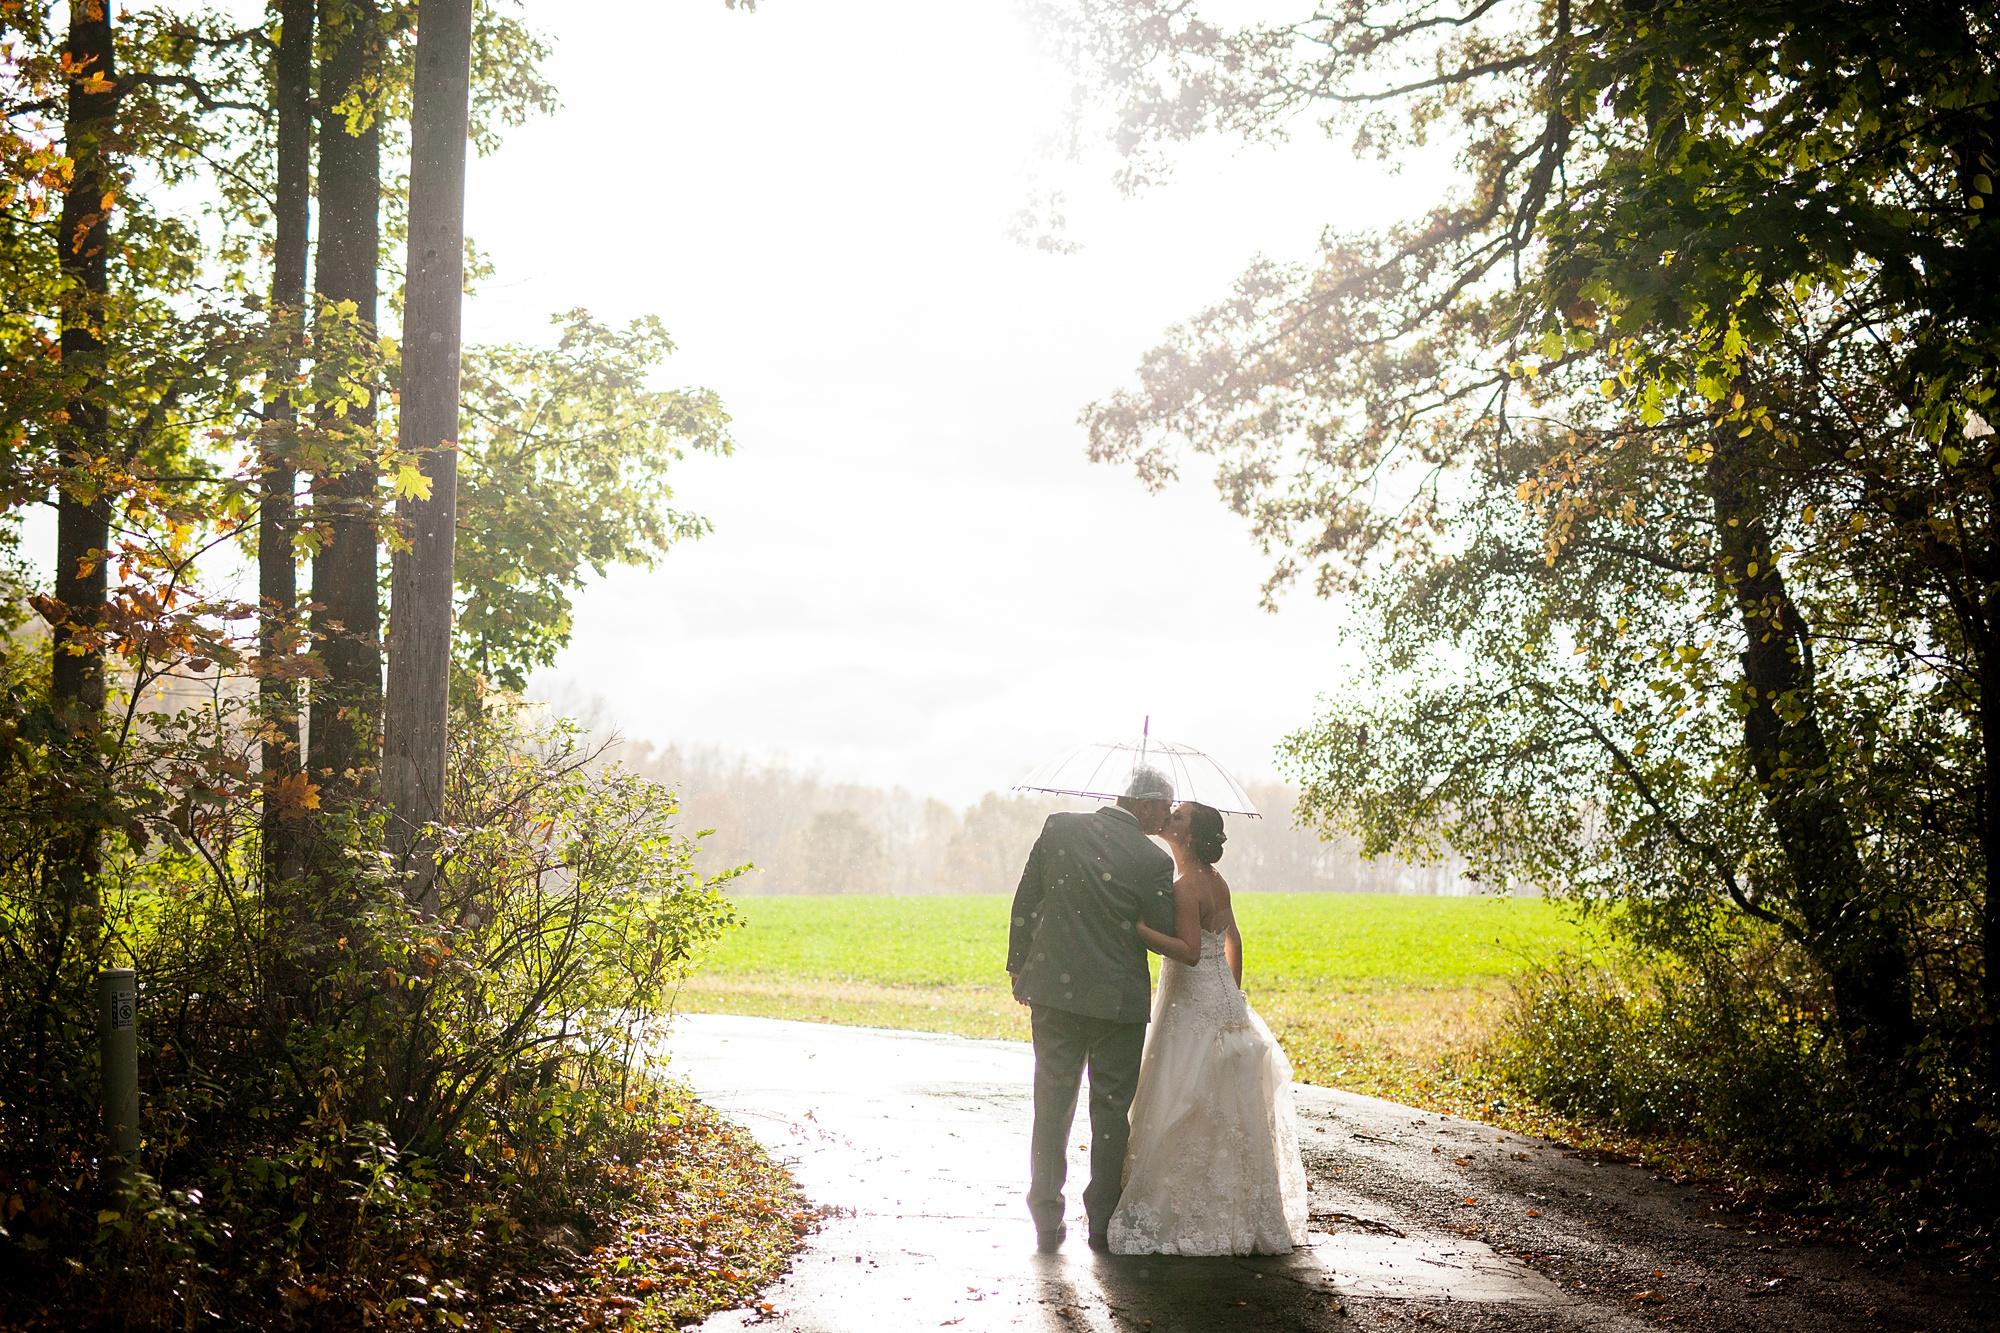 Brandon_Shafer_Photography_Emily_Travis_Kalamazoo_Wedding_Photography_0036.jpg